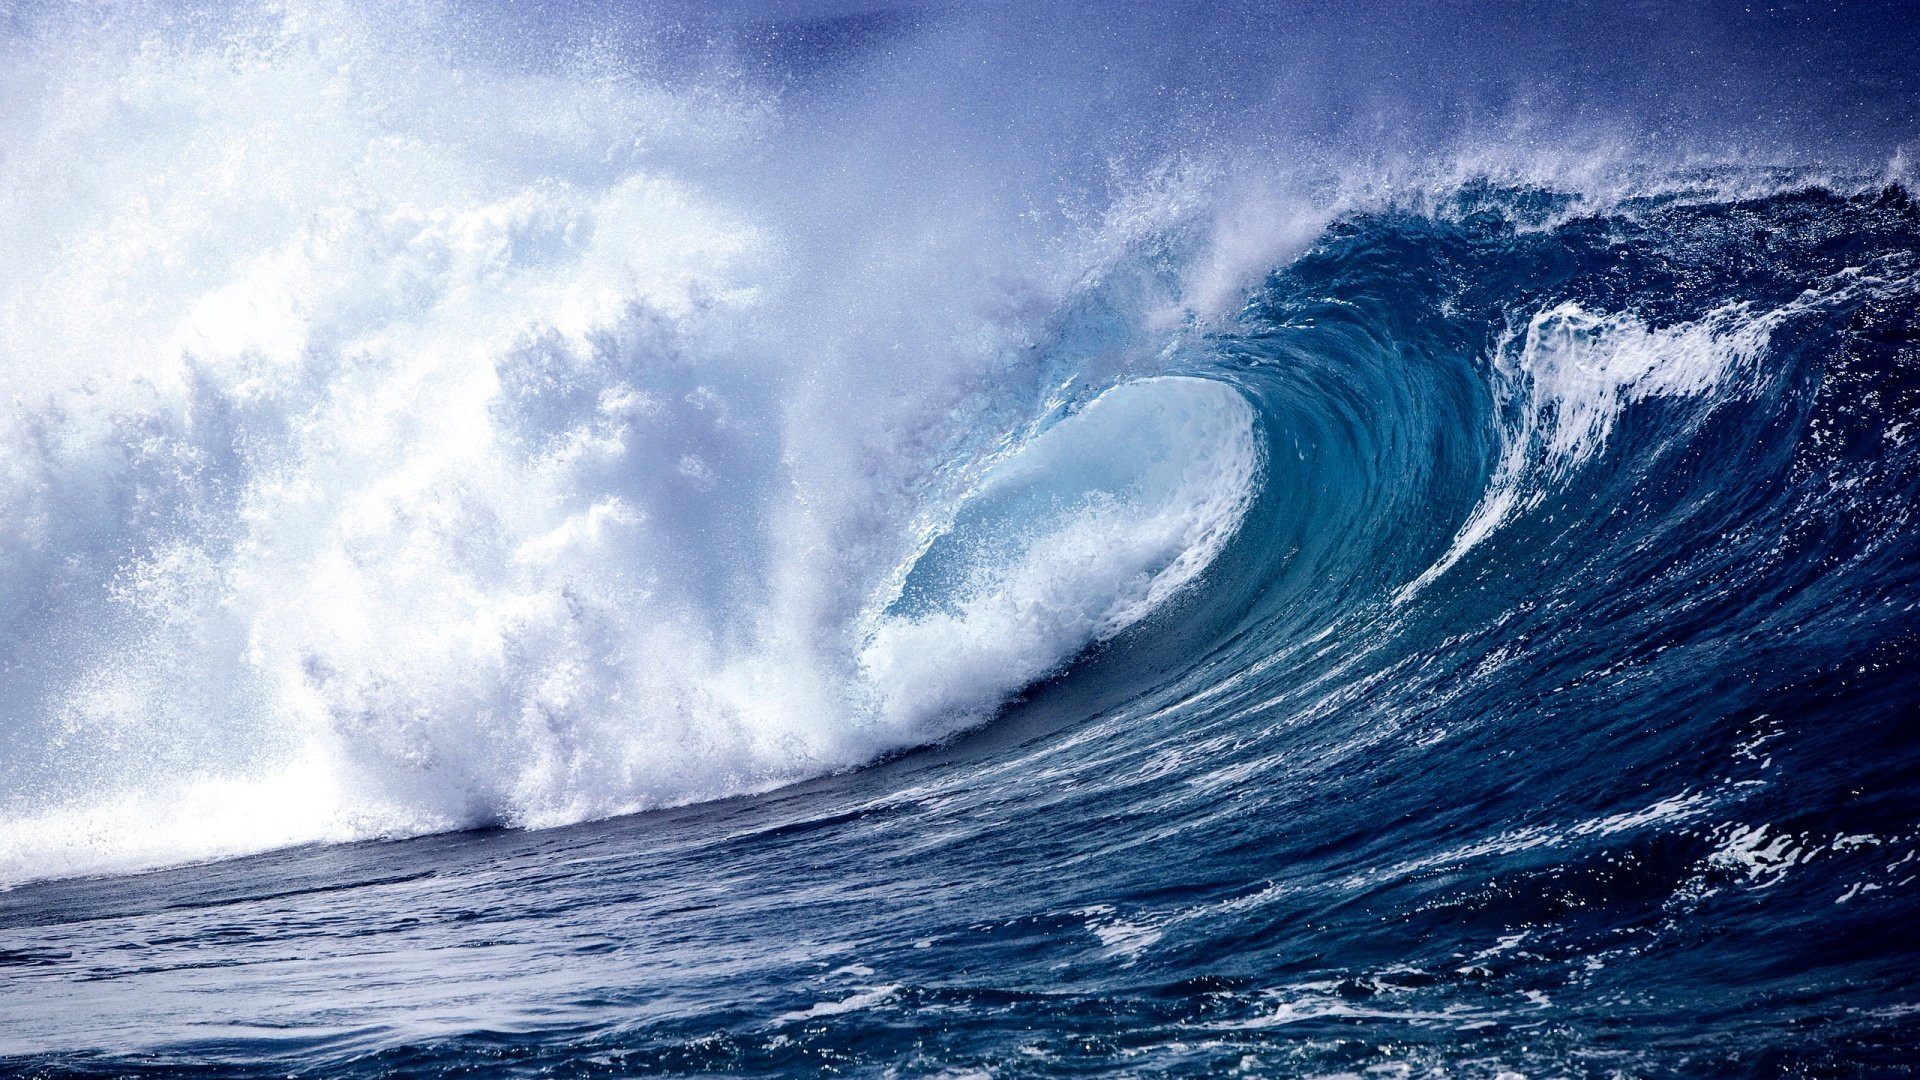 Beautiful Ocean Waves Wallpaper HD